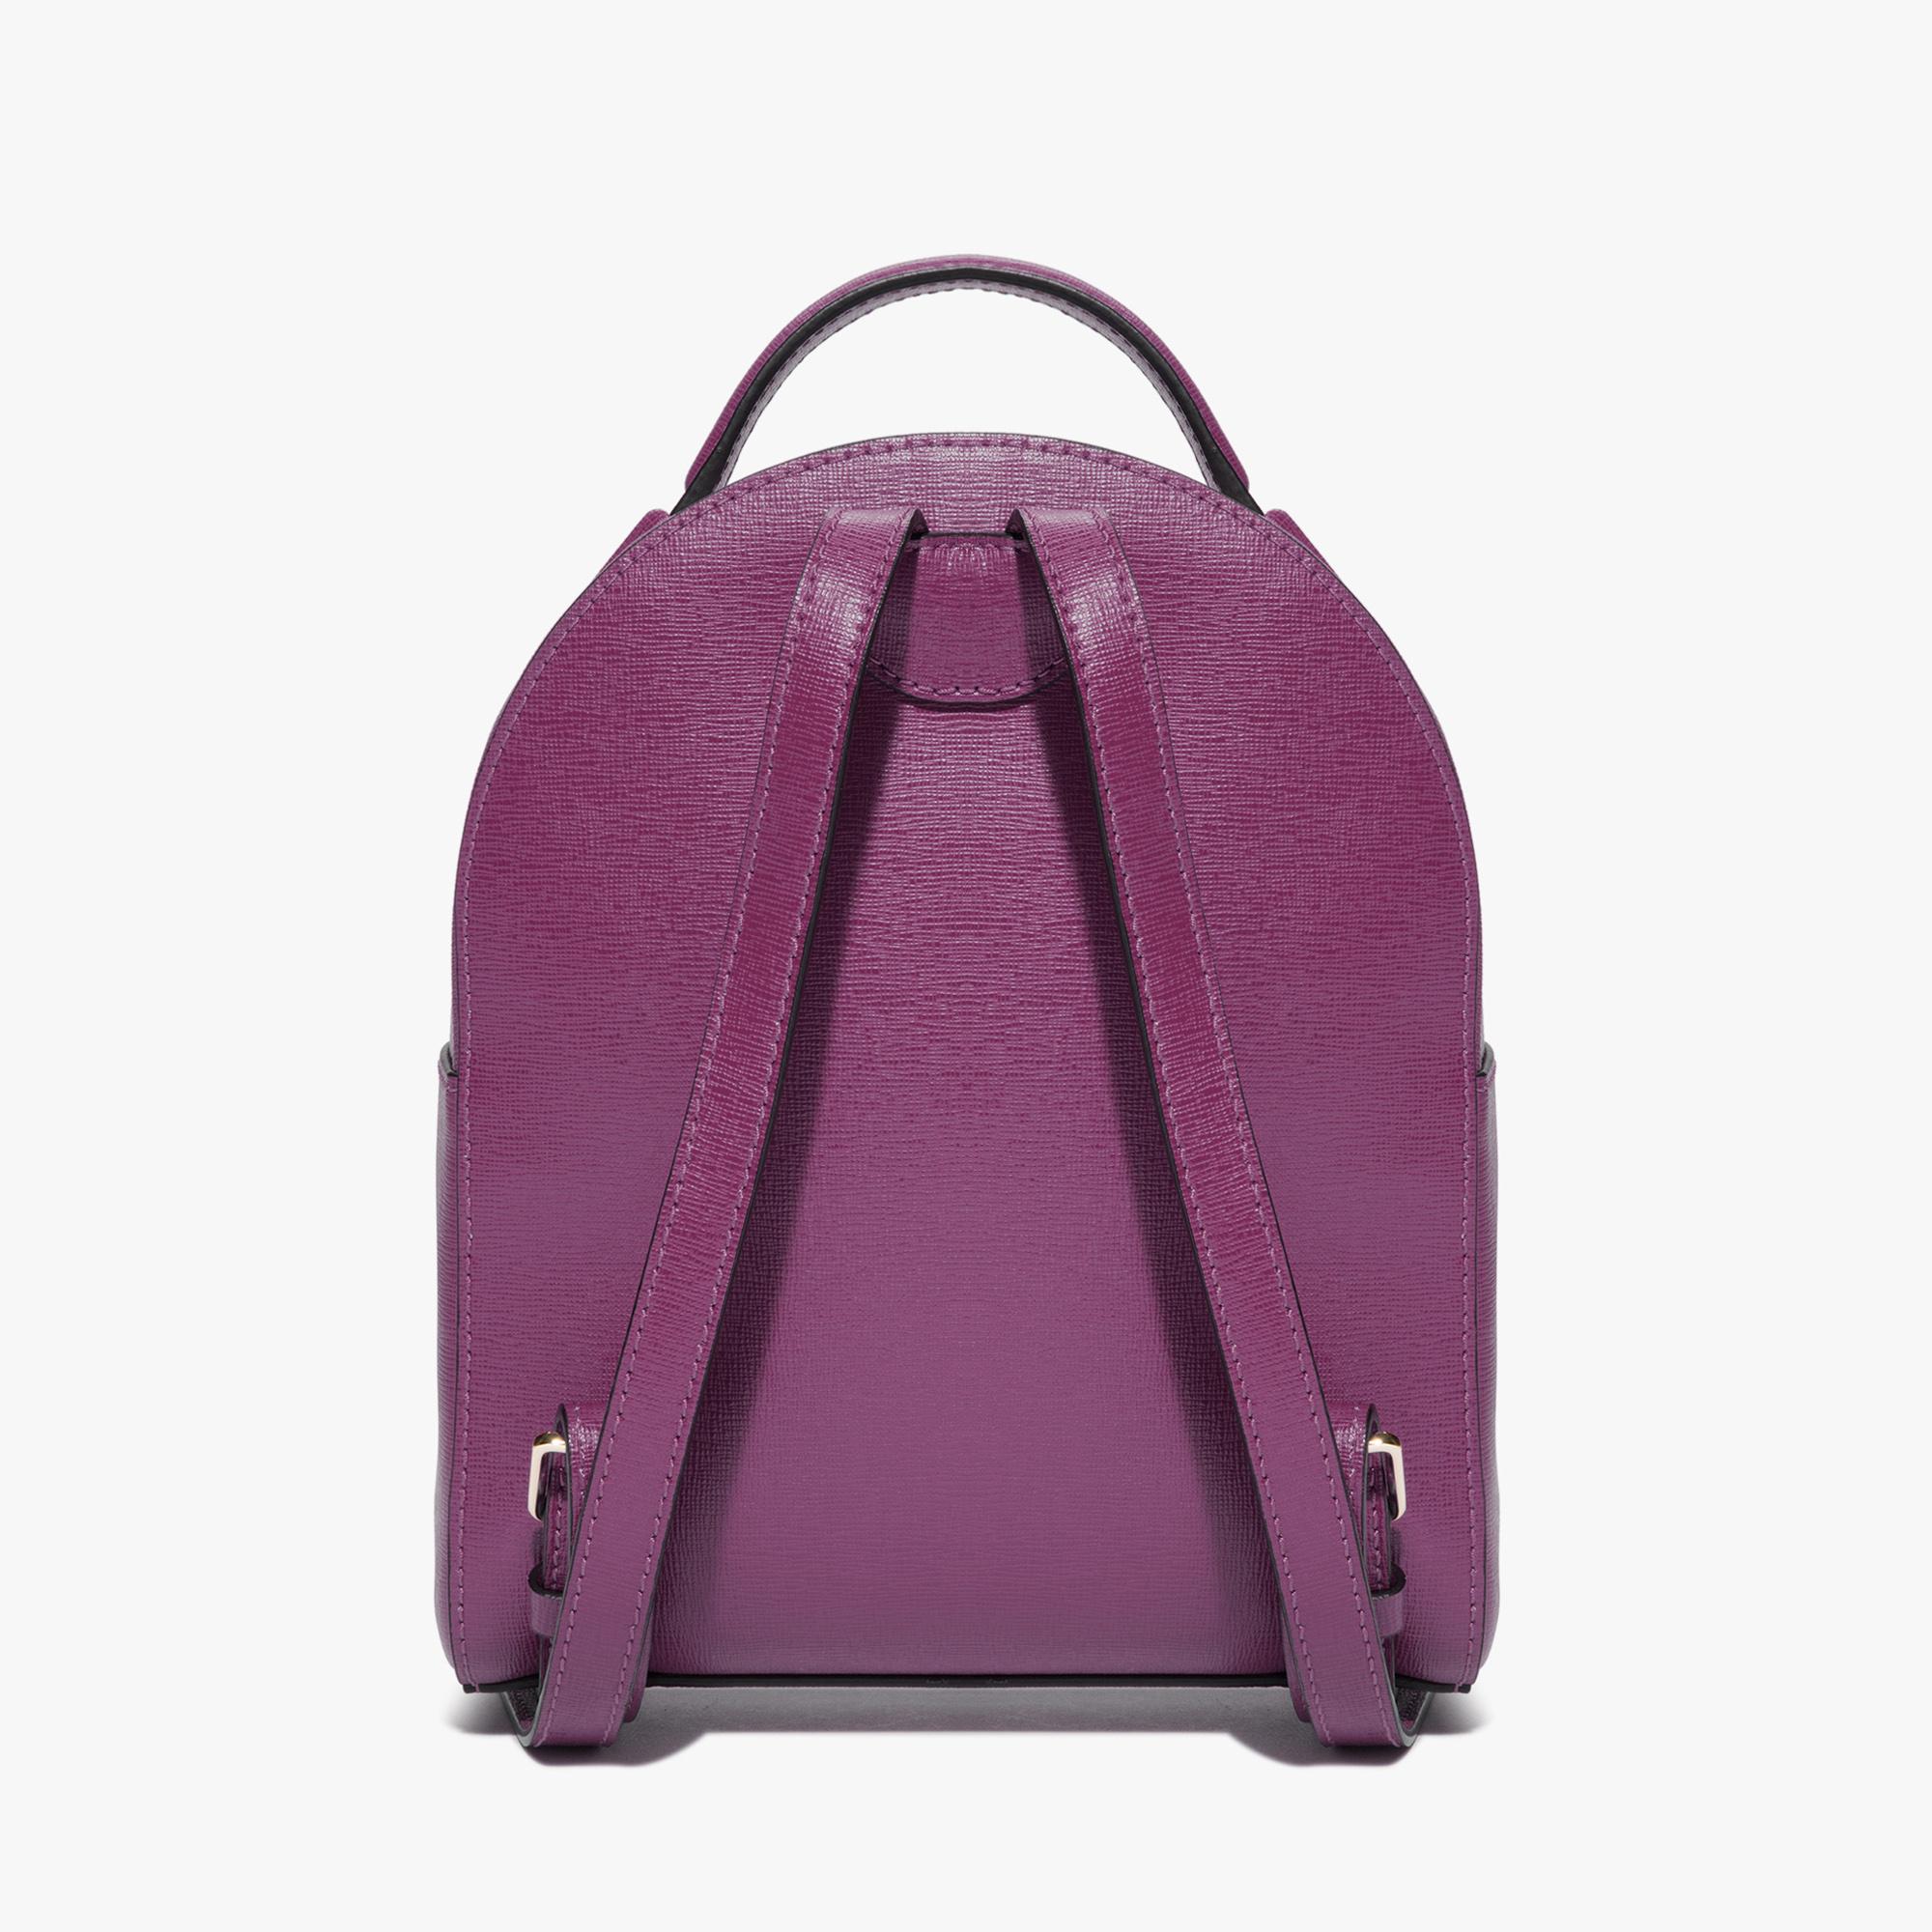 Coccinelle Clementine saffiano mini backpack